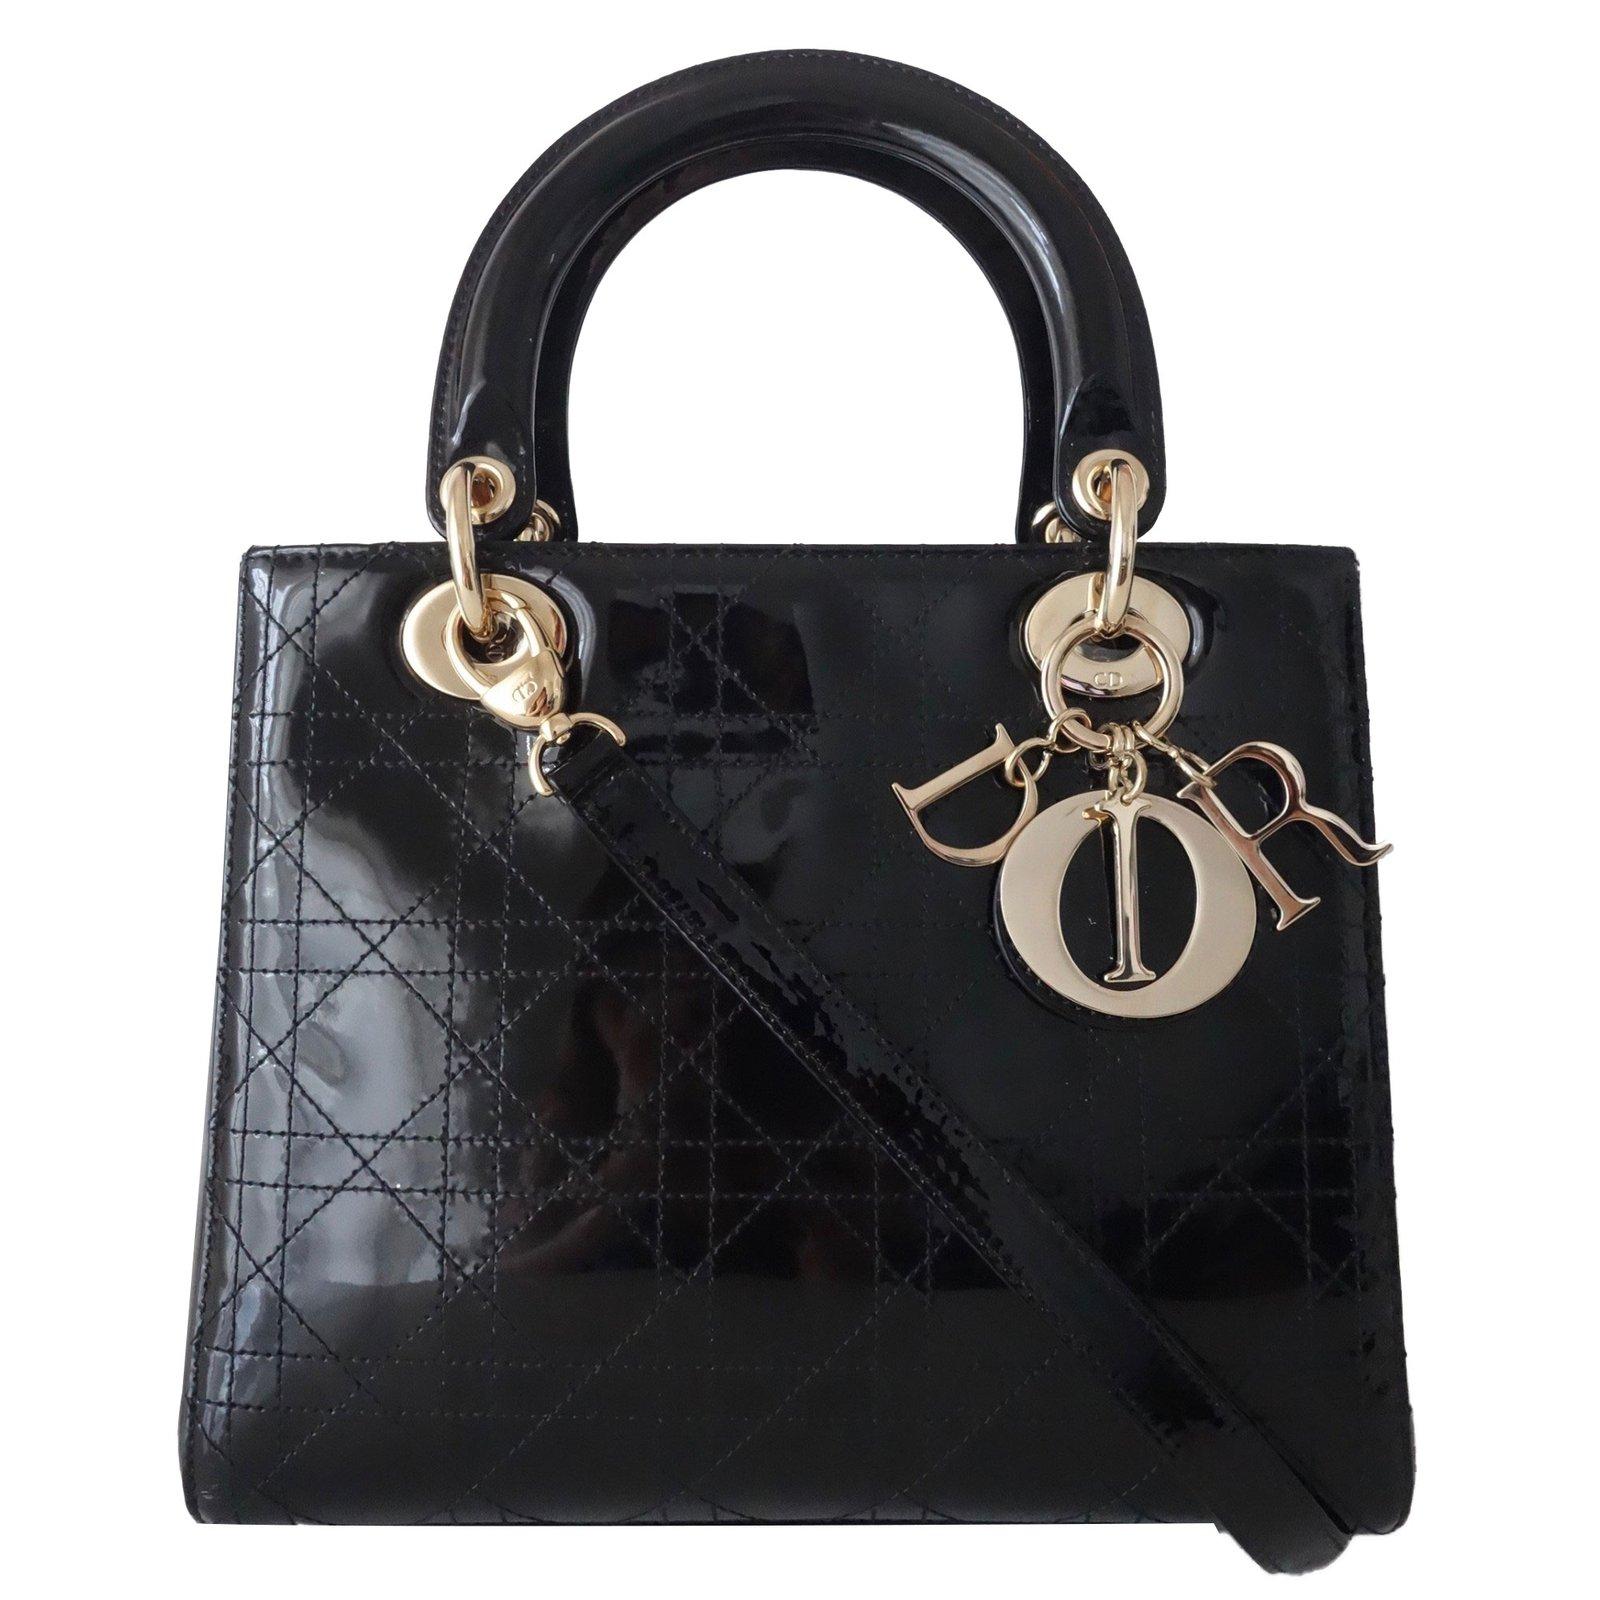 175ea94aa800 LADY vernis Sacs Cuir DIOR à Noir Dior 65178 main Joli Closet ref SAC 0wS6wI